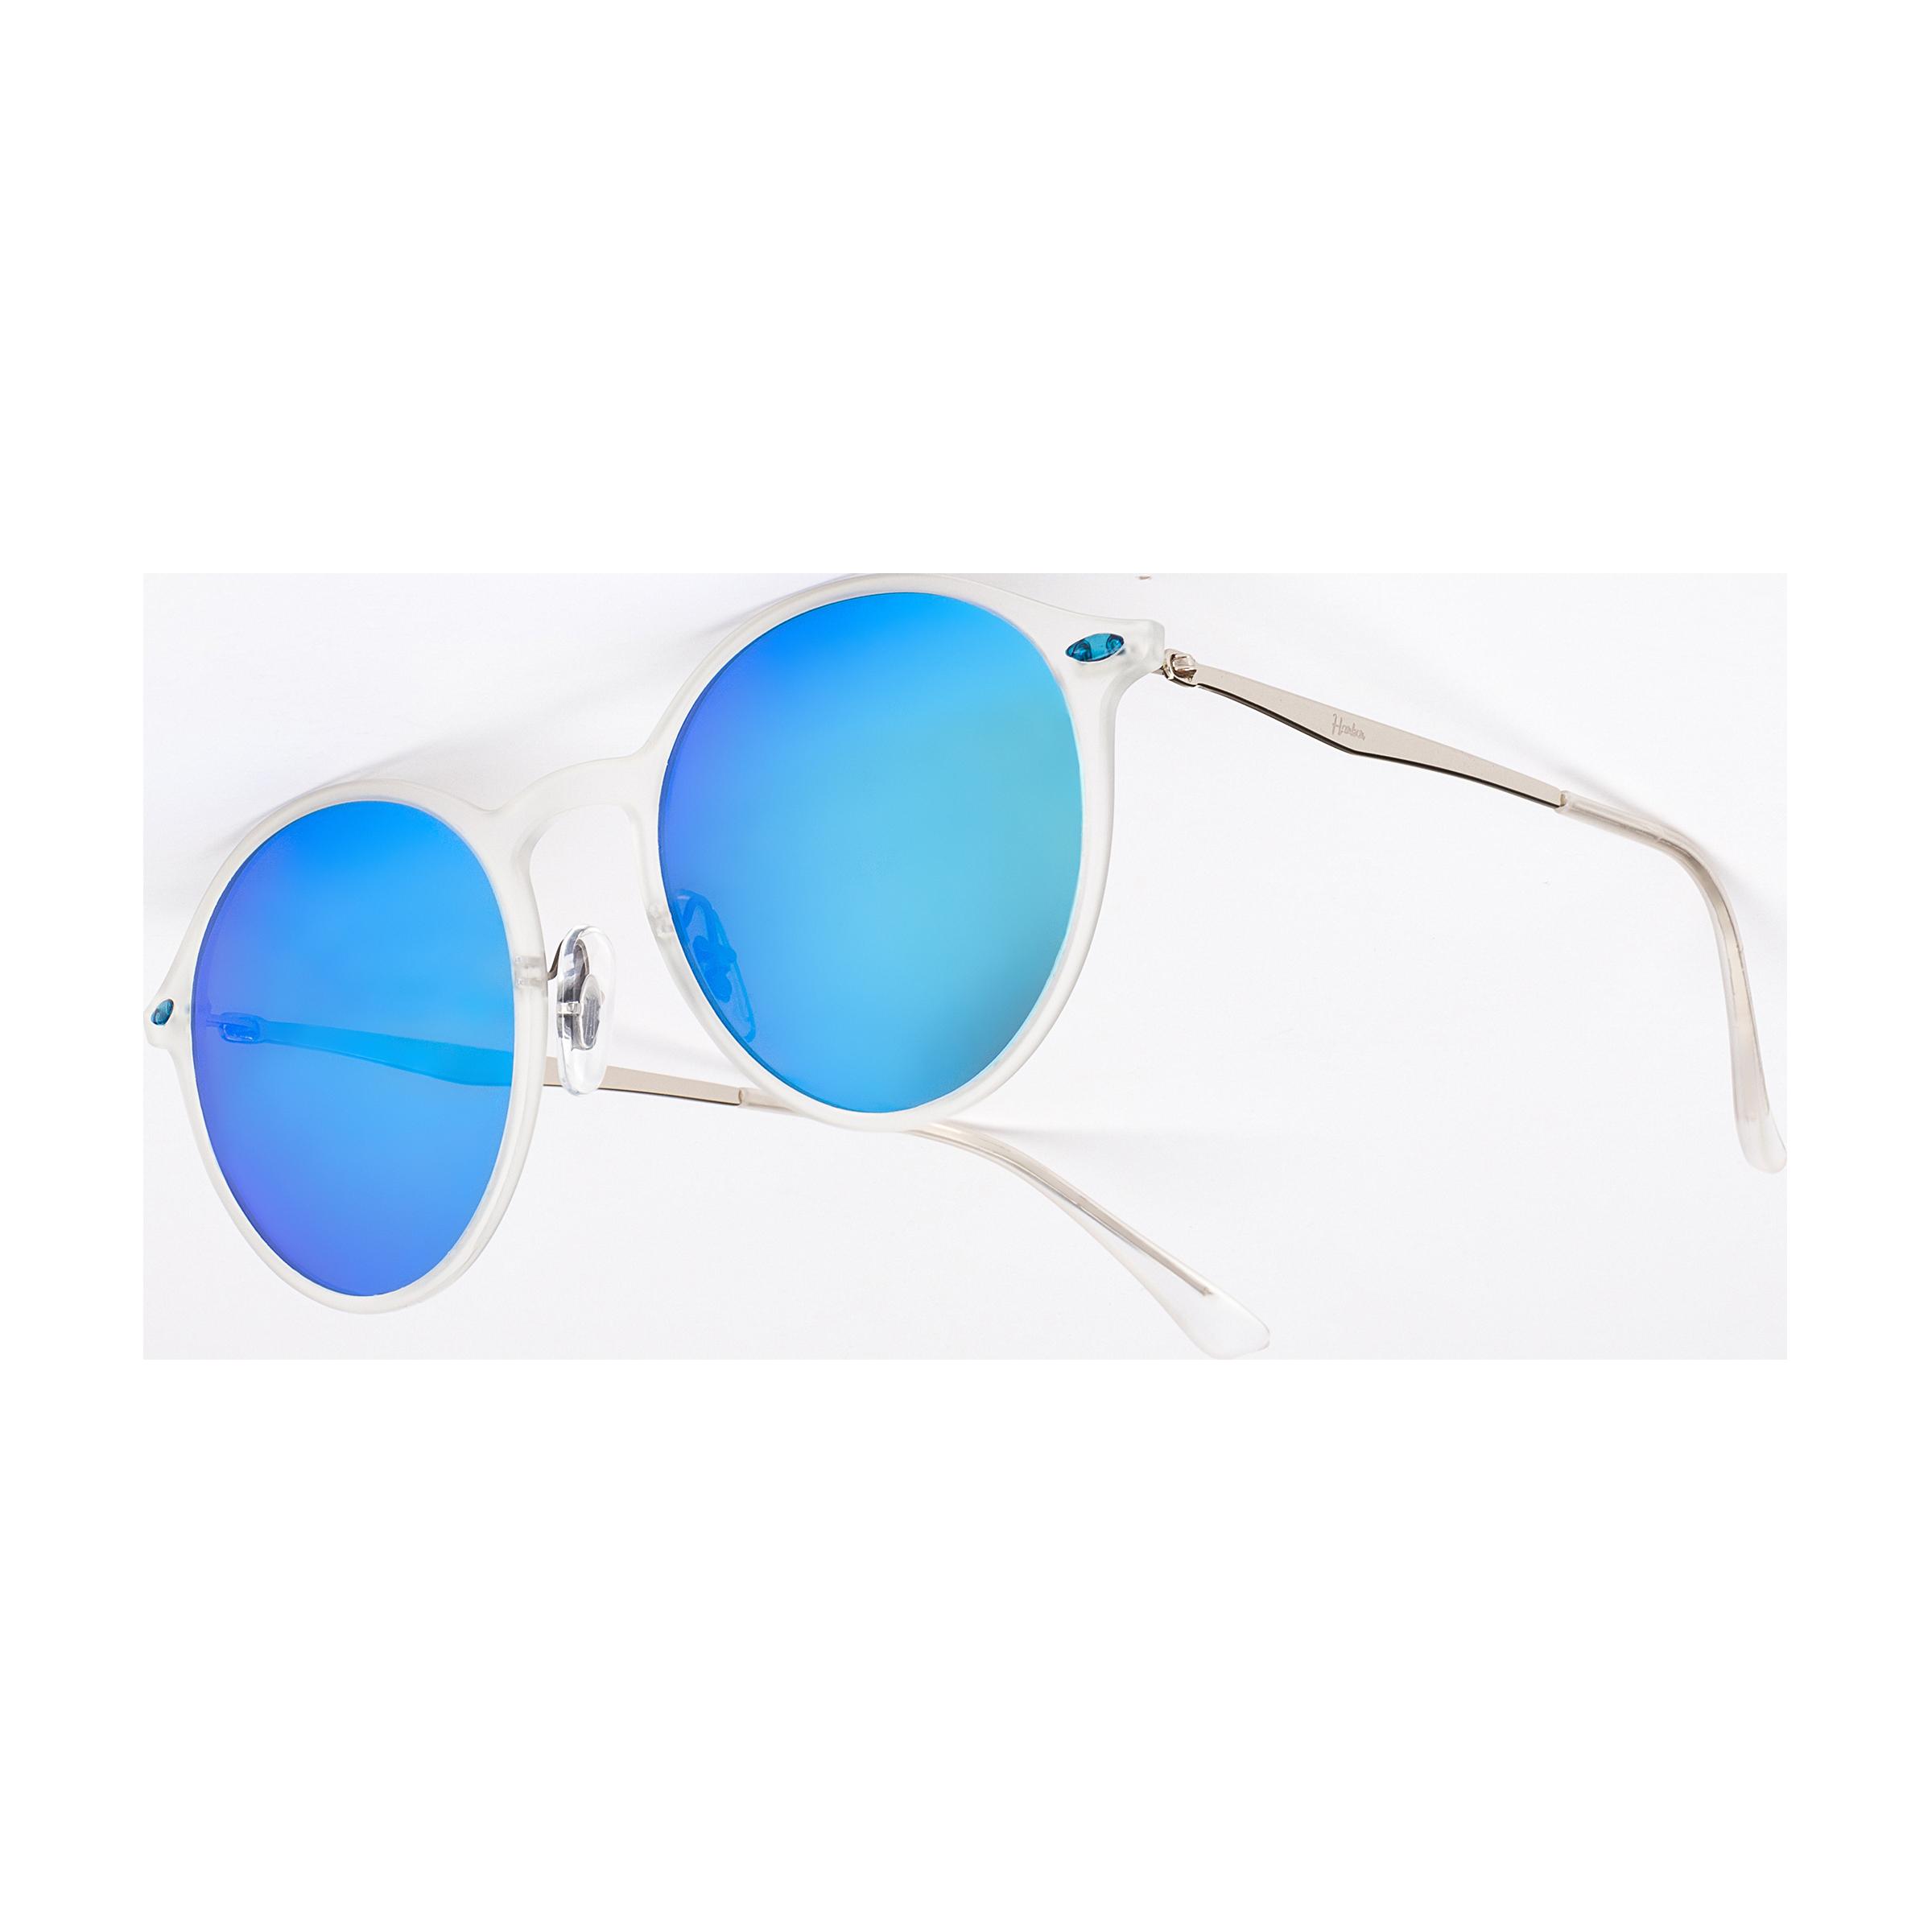 white sunglasses product image